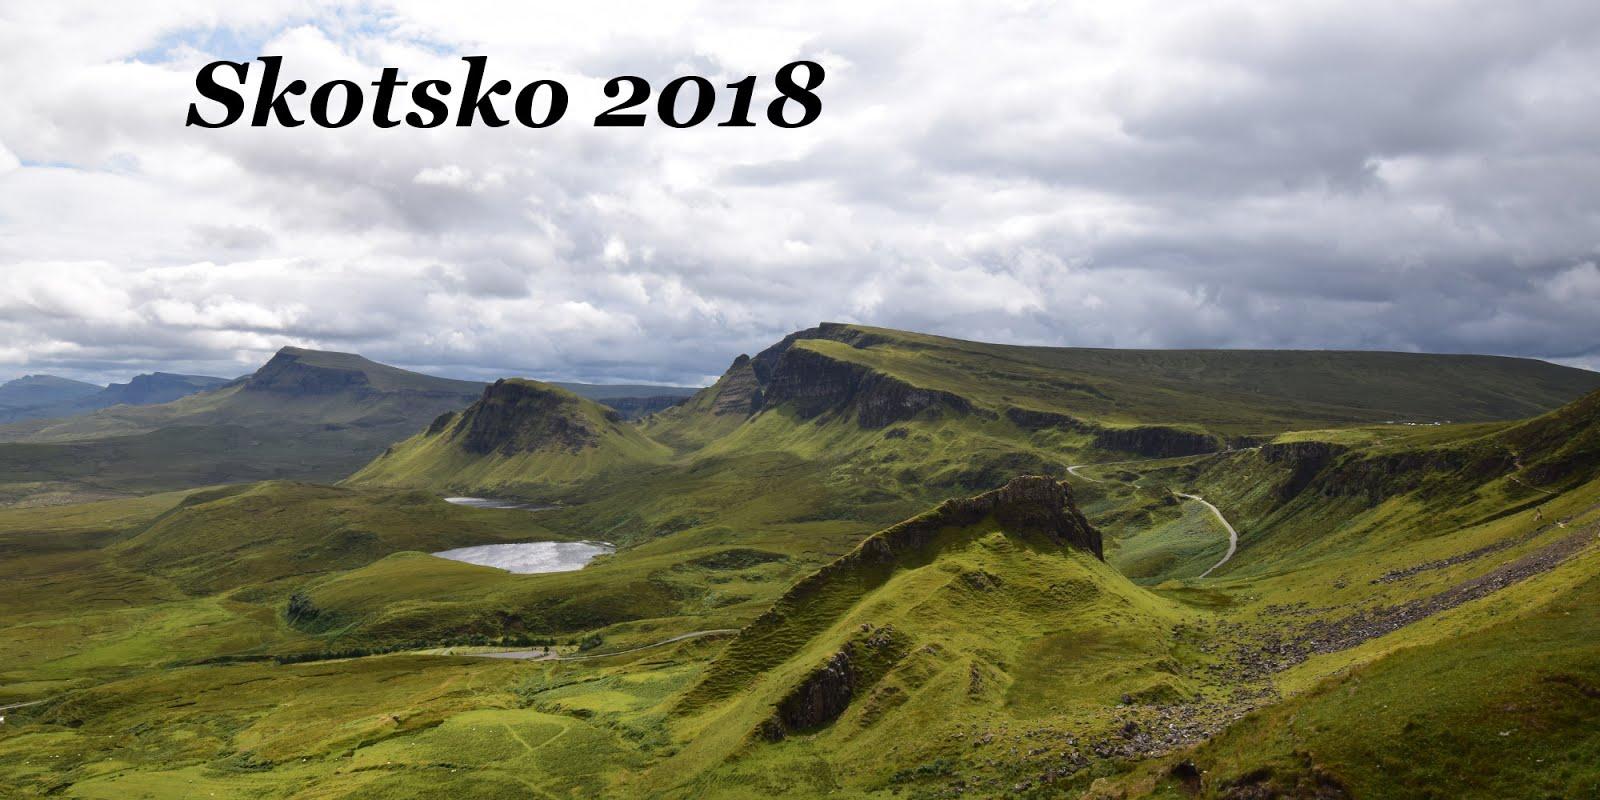 Skotsko 2018